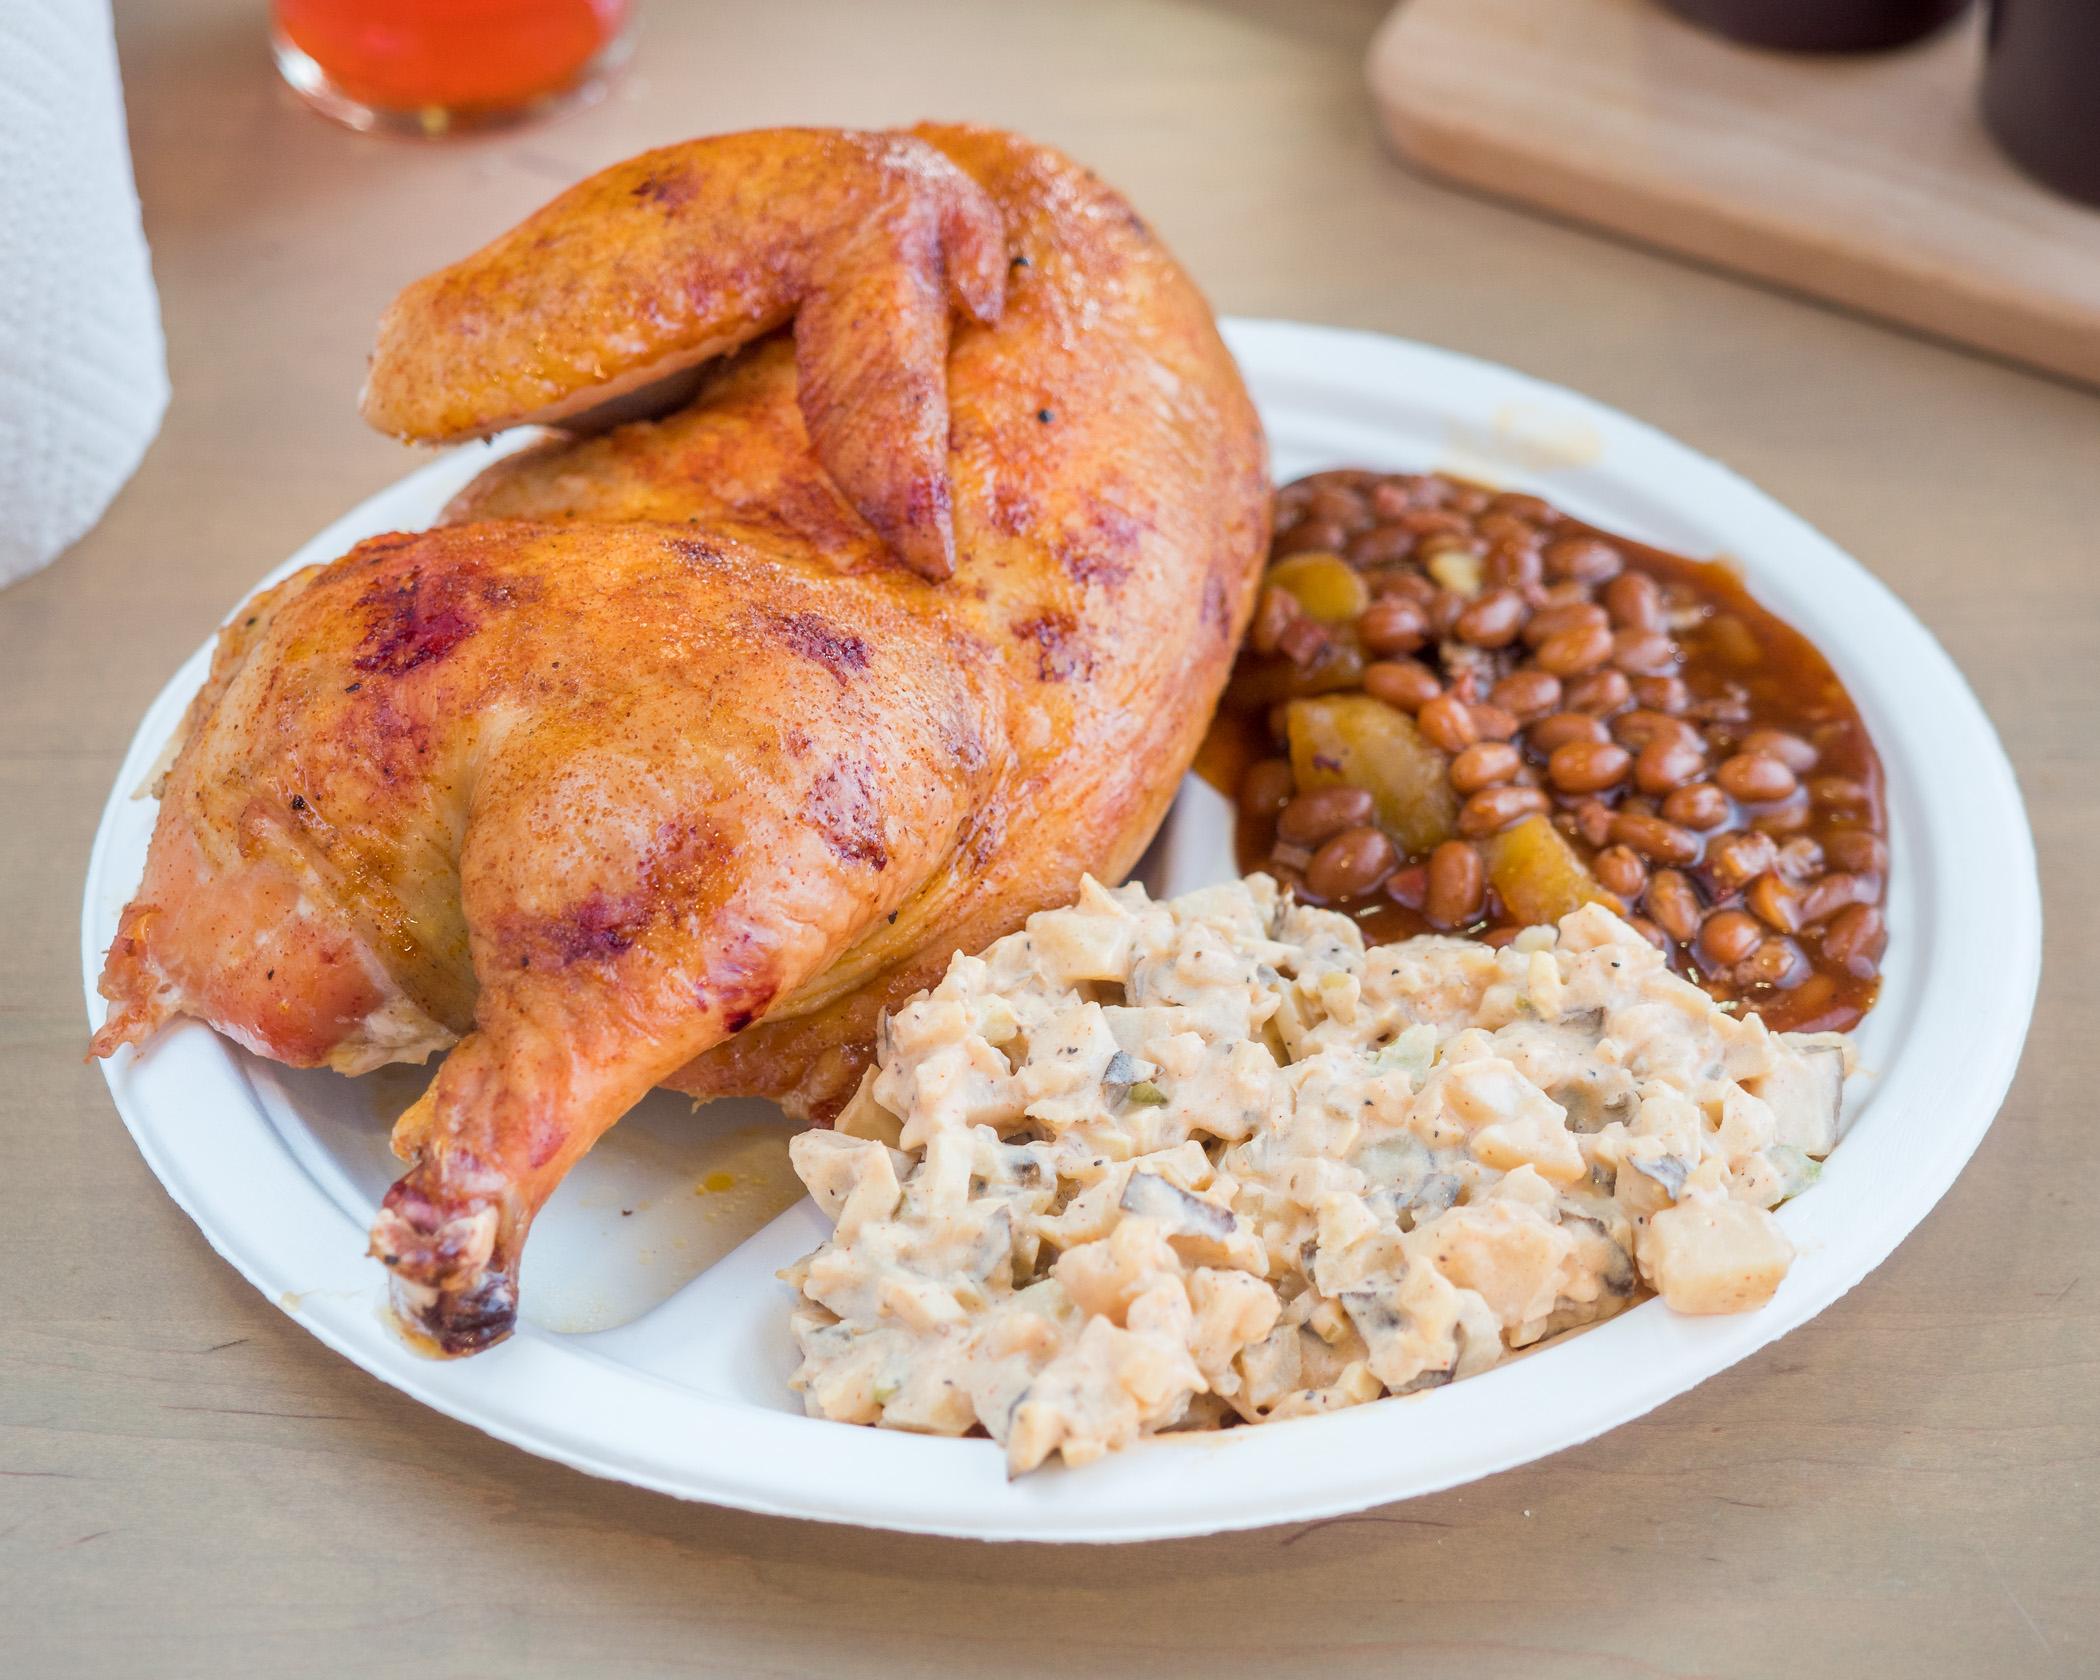 Jeremy Pawlowski Portland Texas Austin Amarillo Food Photographer Photography Fare Photo Studios bbq barbecue barbeque roast chicken